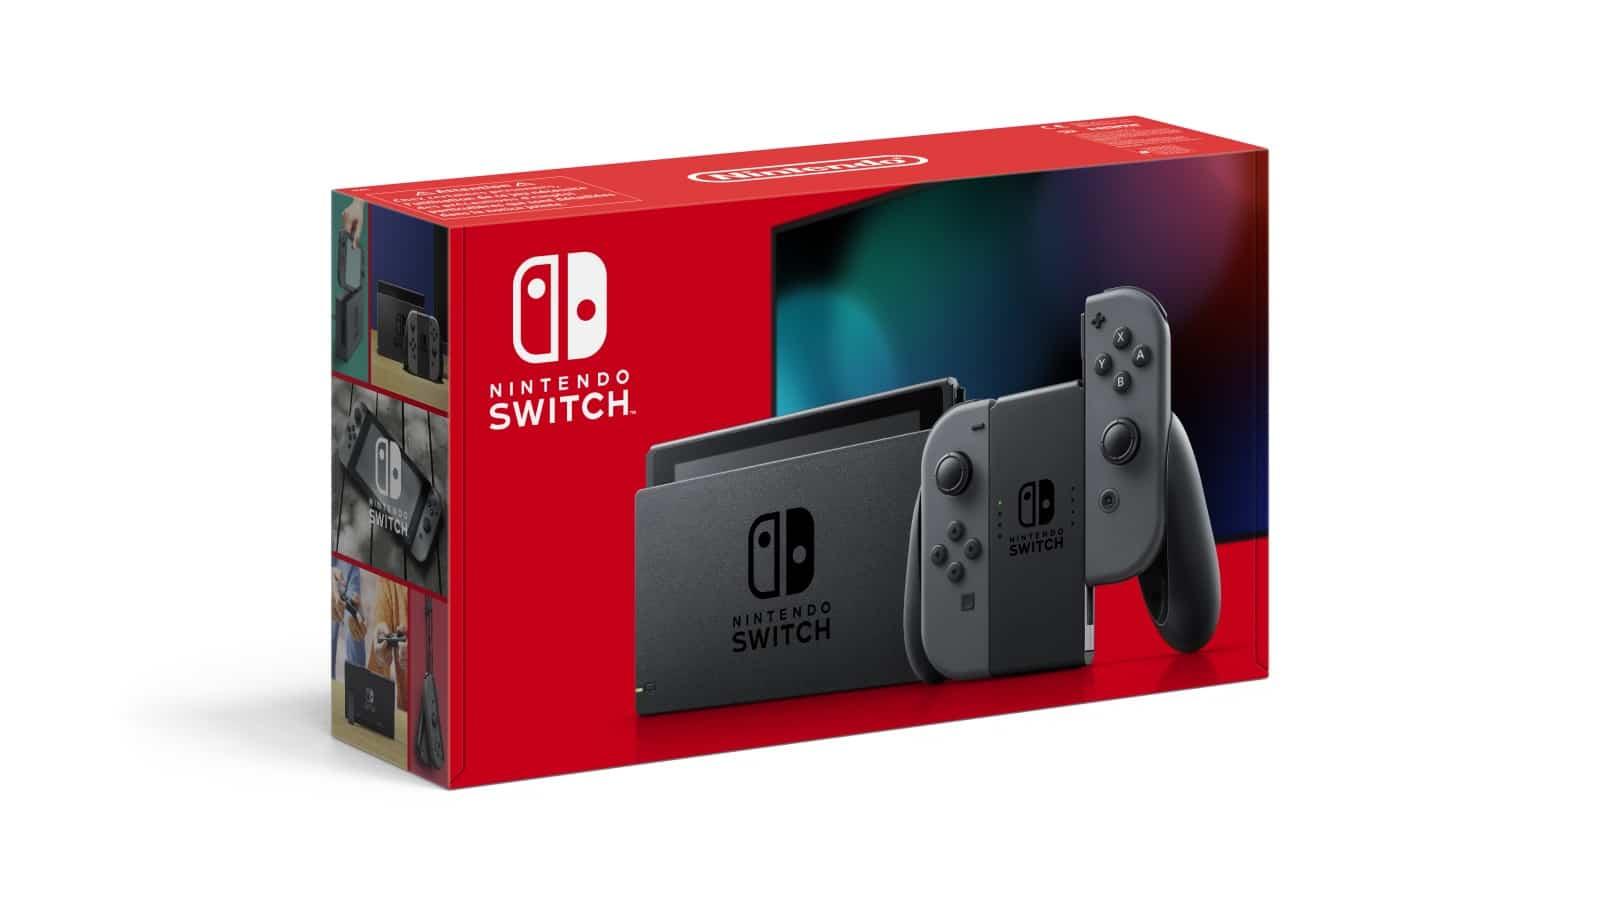 Nintendo Switch עם ג'וי-קון אפורים